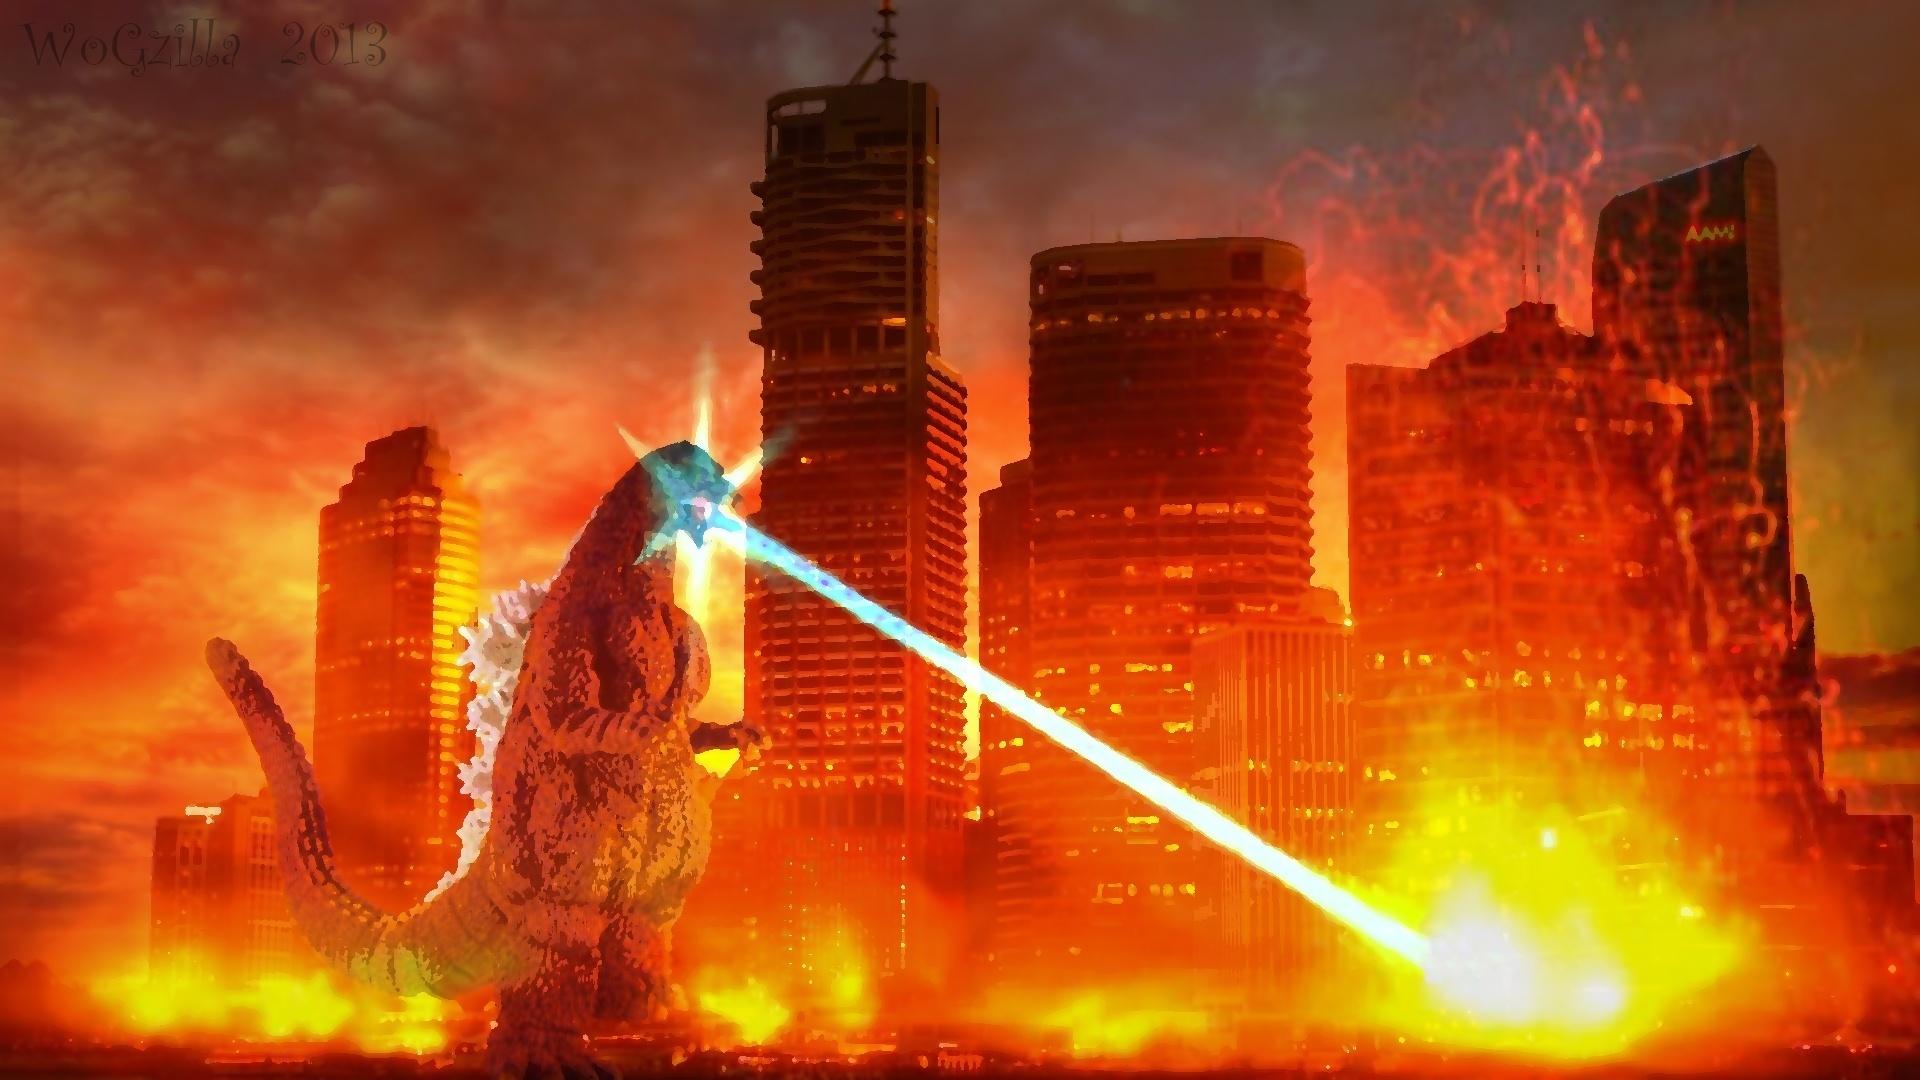 Apocalypse City Fire Apocalyptic City On Fi...